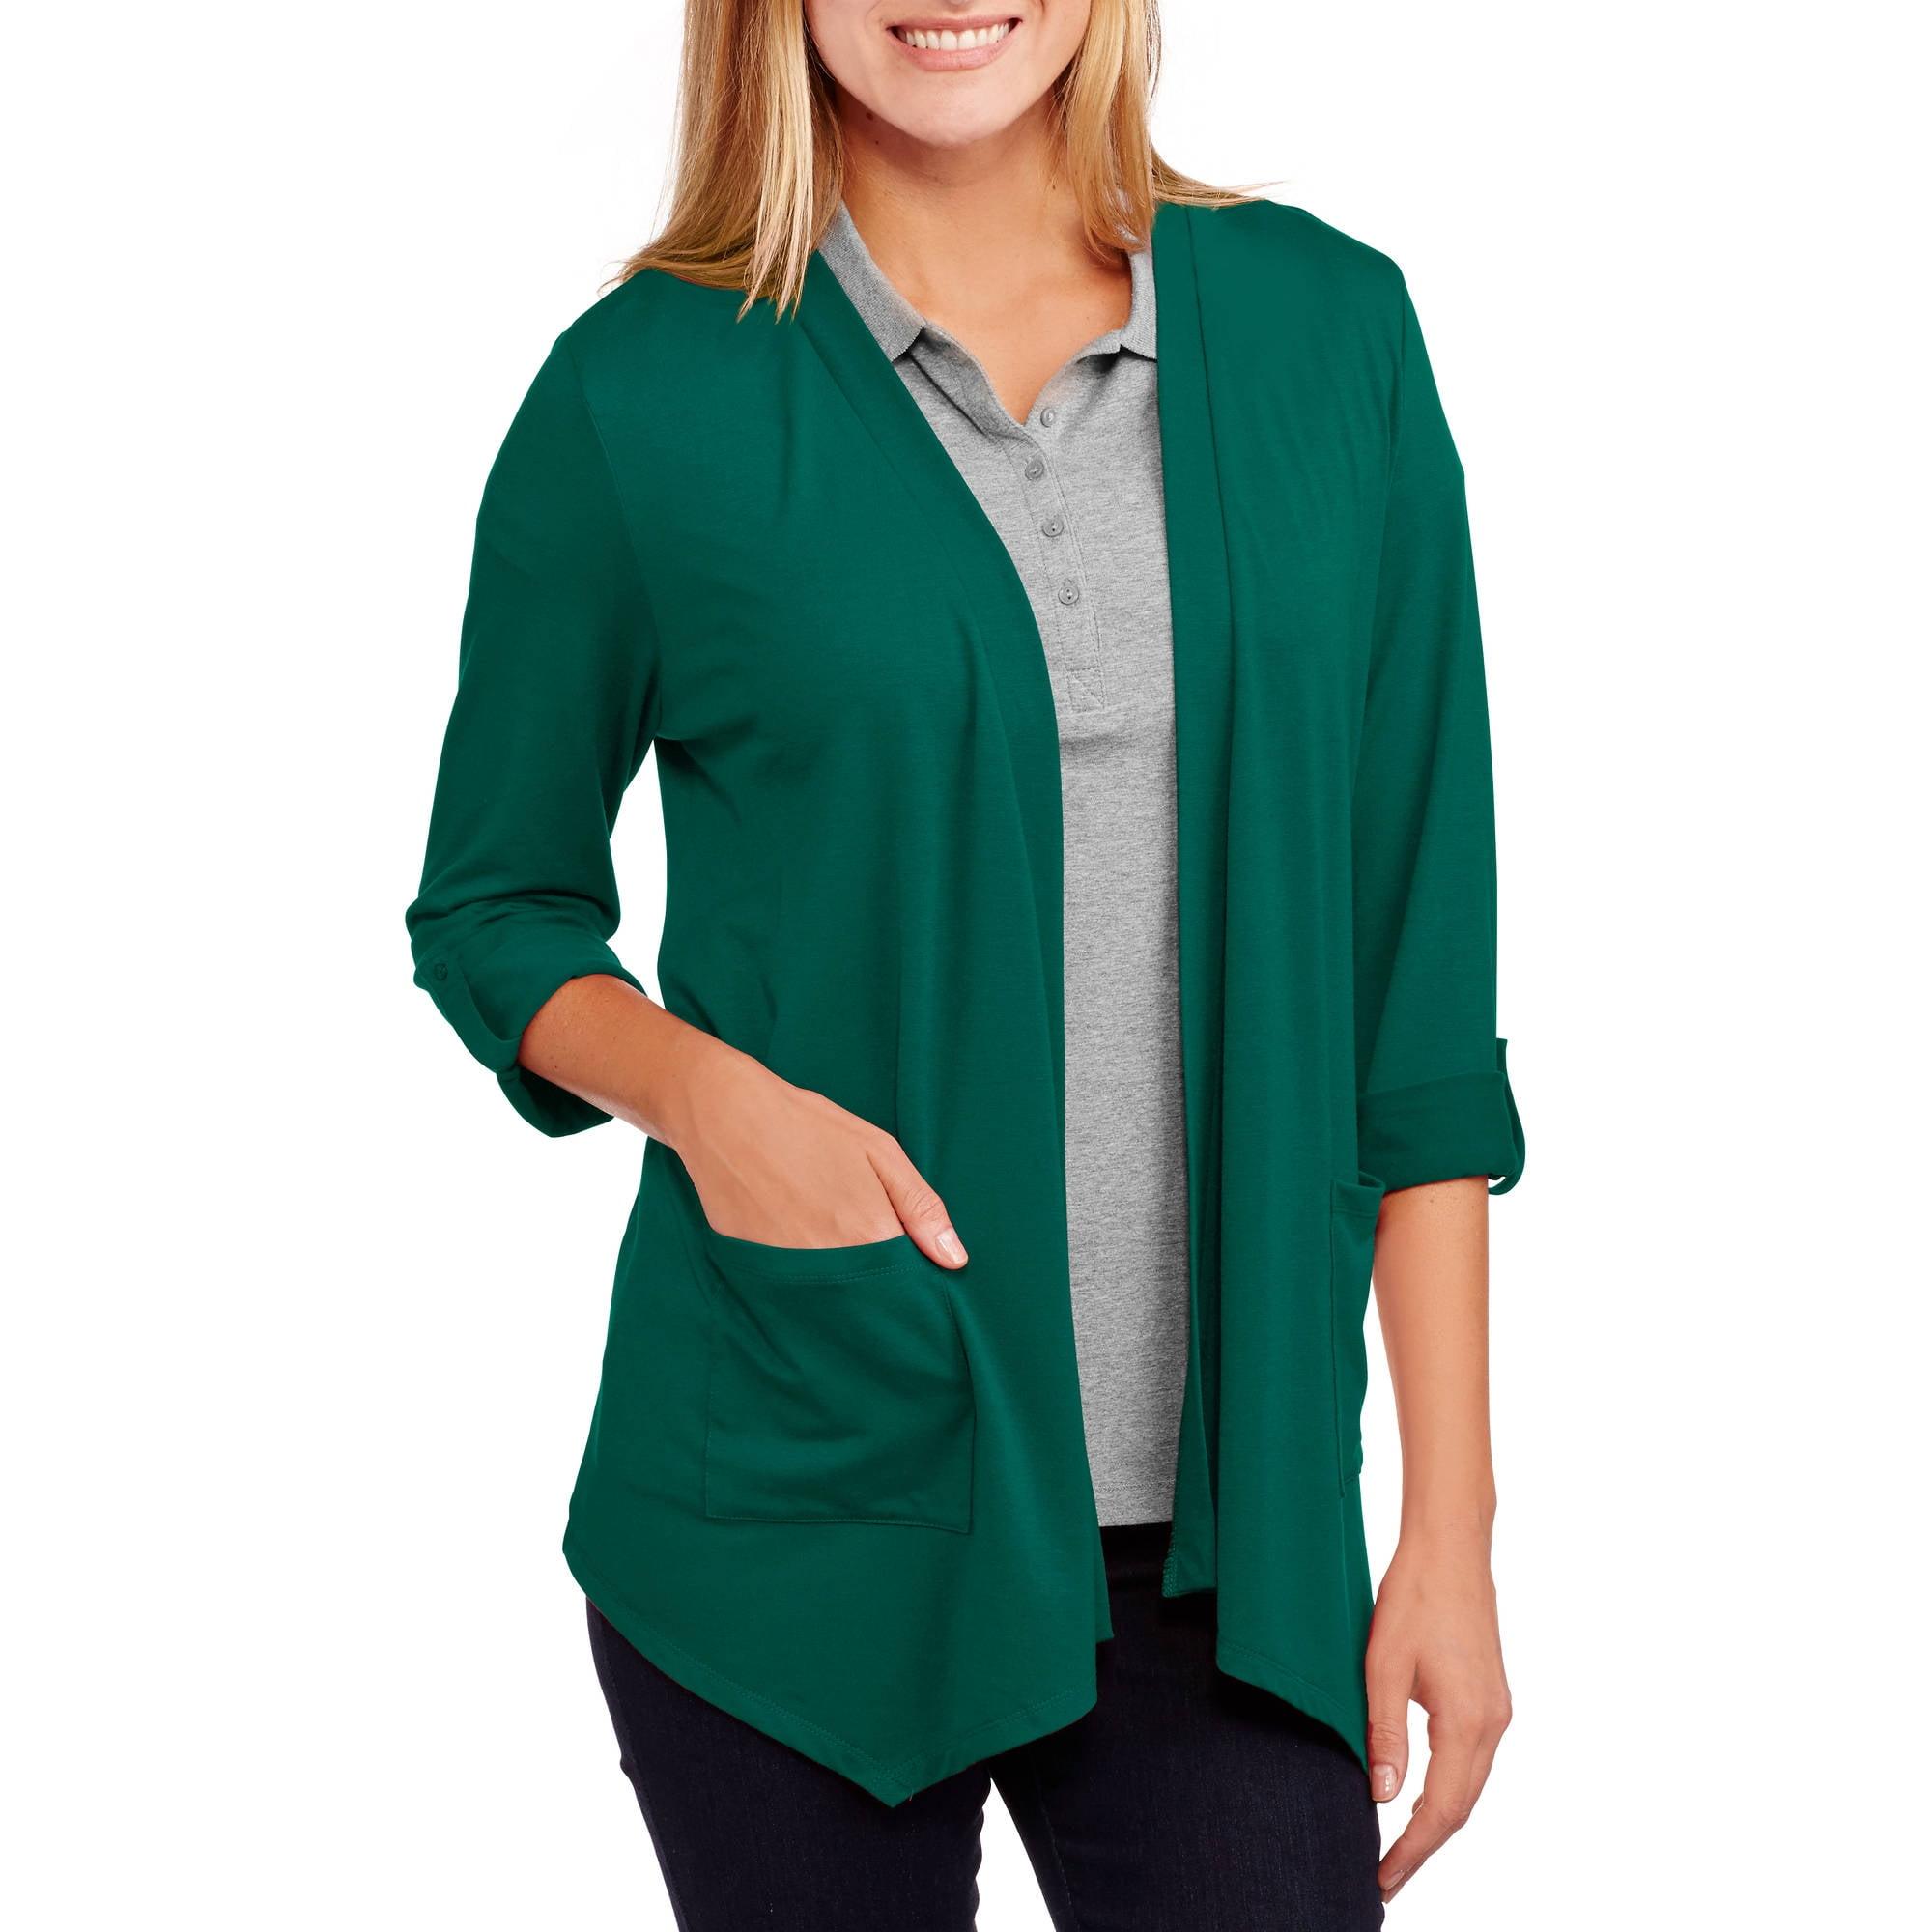 Faded Glory Women S 2 Pocket Cardigan Sweater Walmart Com